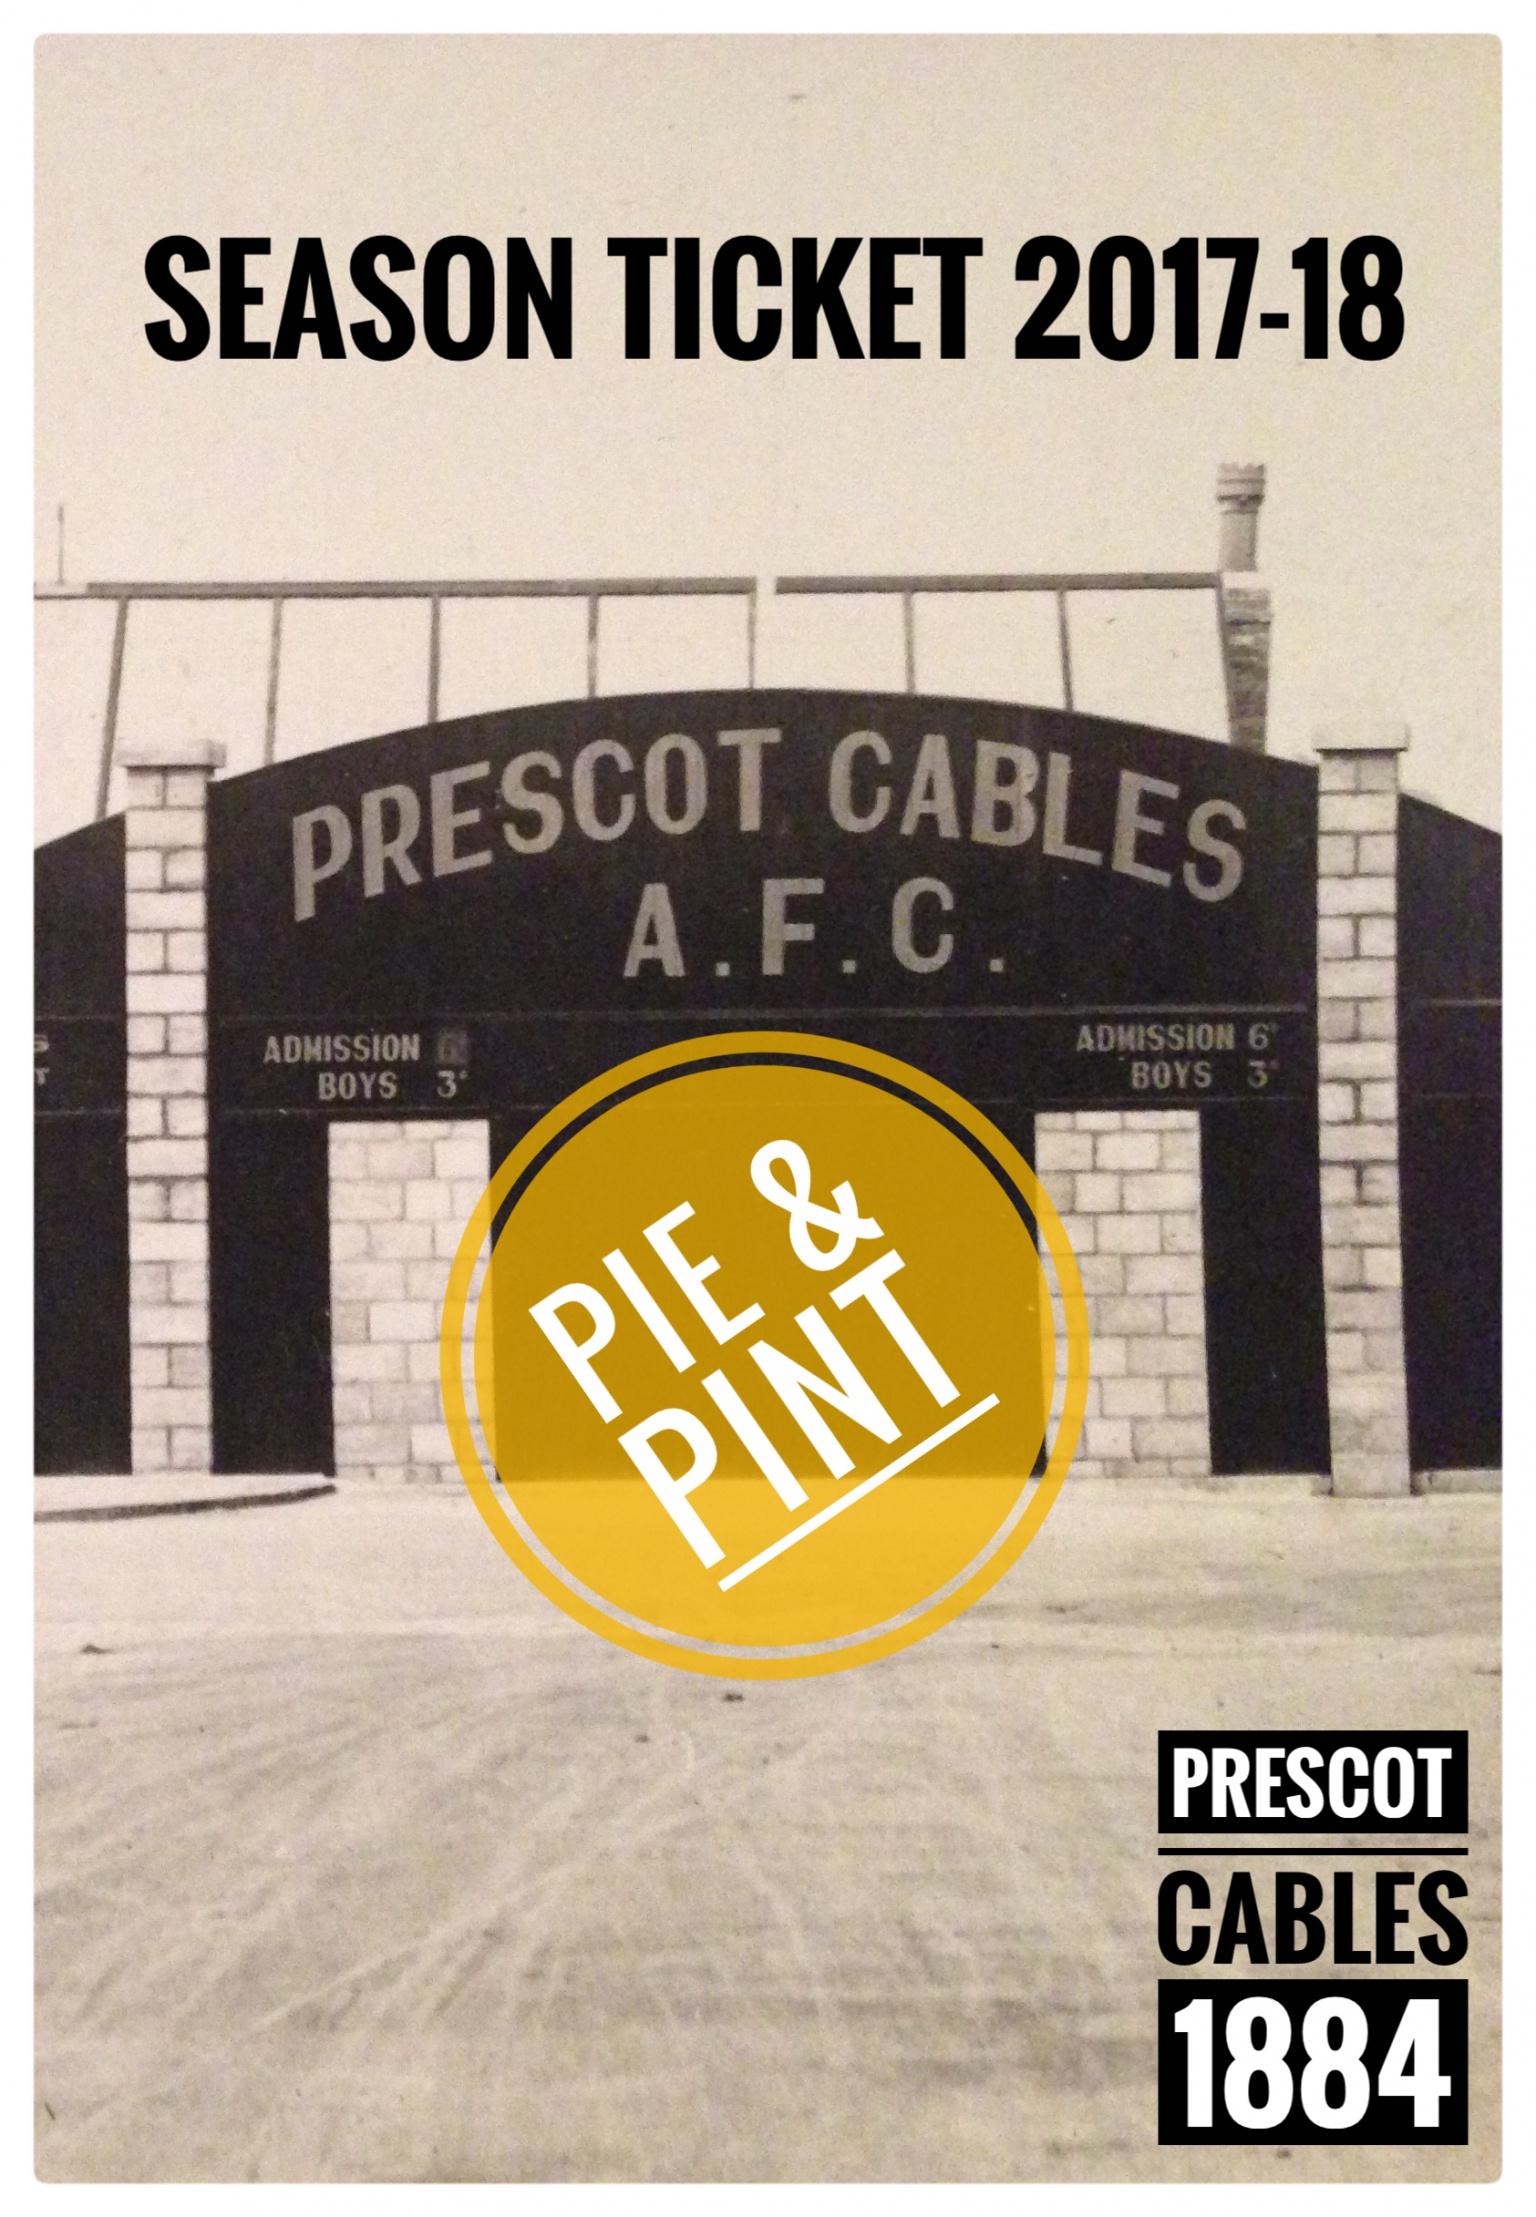 Image: Concessions Pie & Pint Season Ticket 17-18